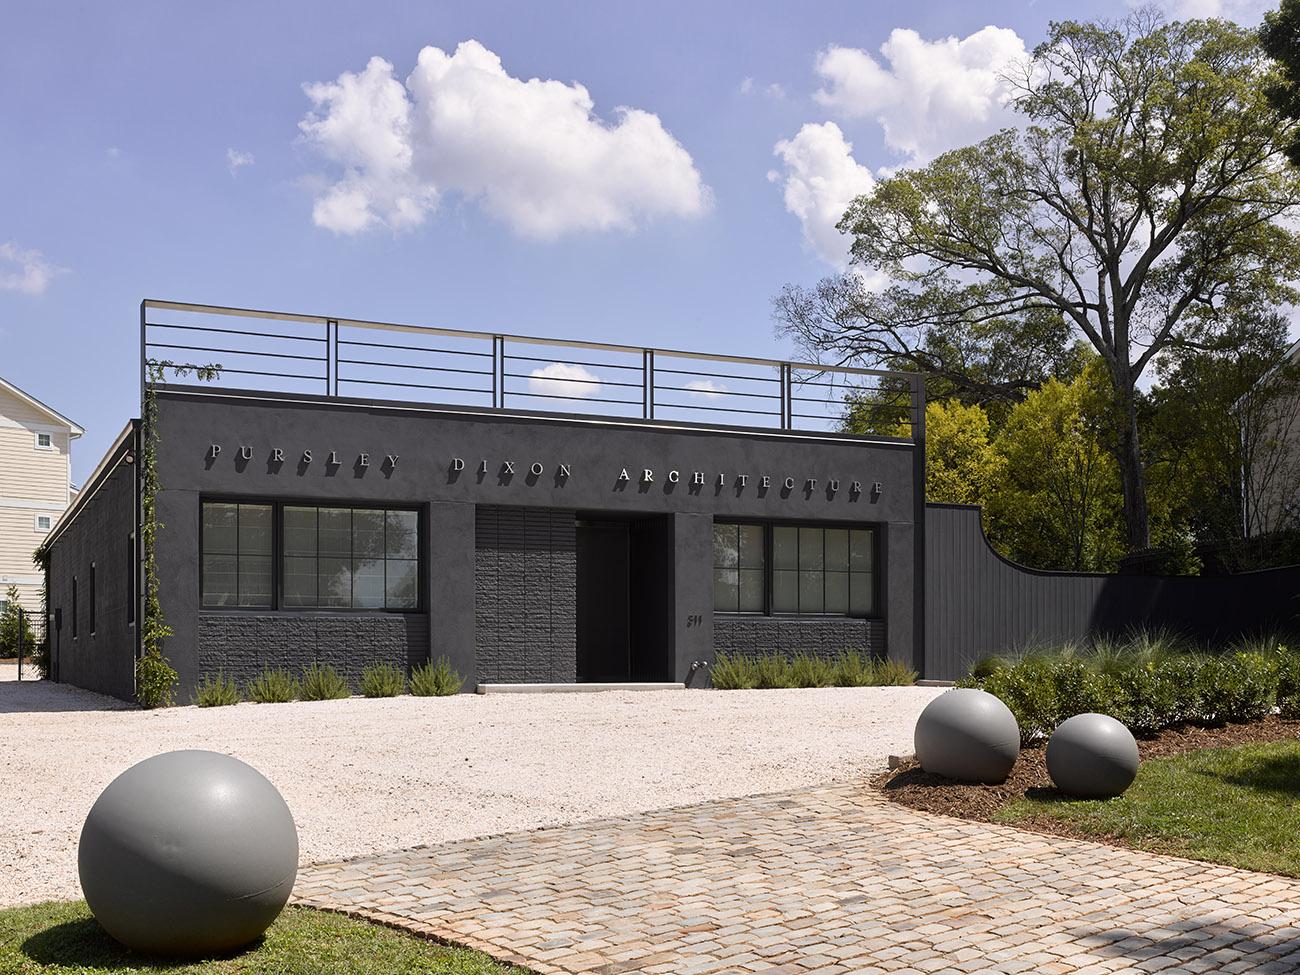 Office Cribs: Architects Ken Pursley and Craig Dixon transform 'simple, dumb box' into their modern, dream office